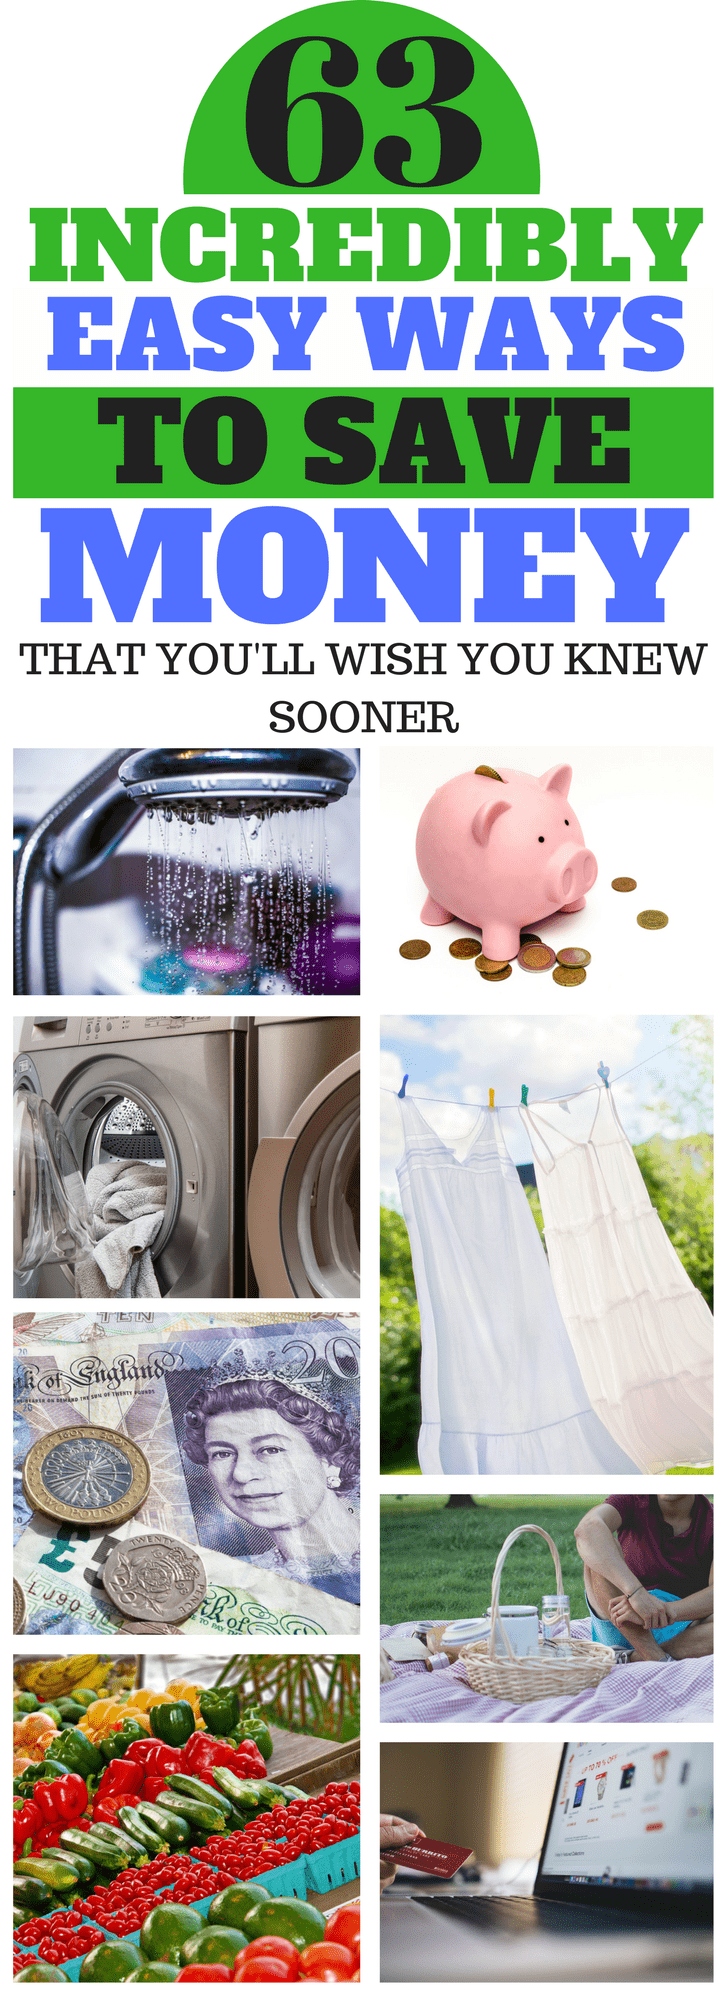 63 incredibly easy ways to save money that you'll wish you knew sooner #moneysaving #savemoney #savings #frugal #debt #budget #budgetingideas #budgetingforfamilies #savinghacks